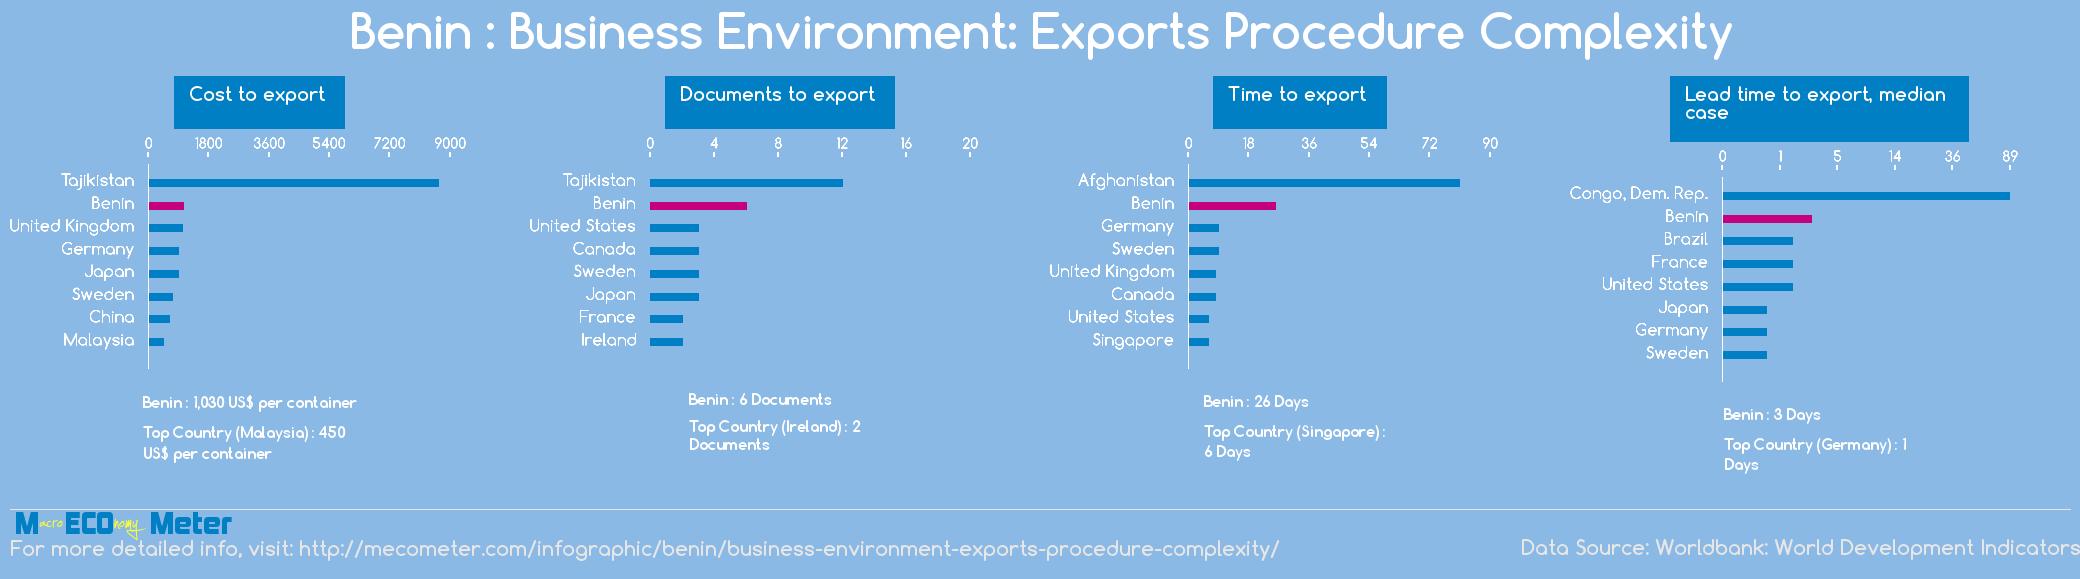 Benin : Business Environment: Exports Procedure Complexity